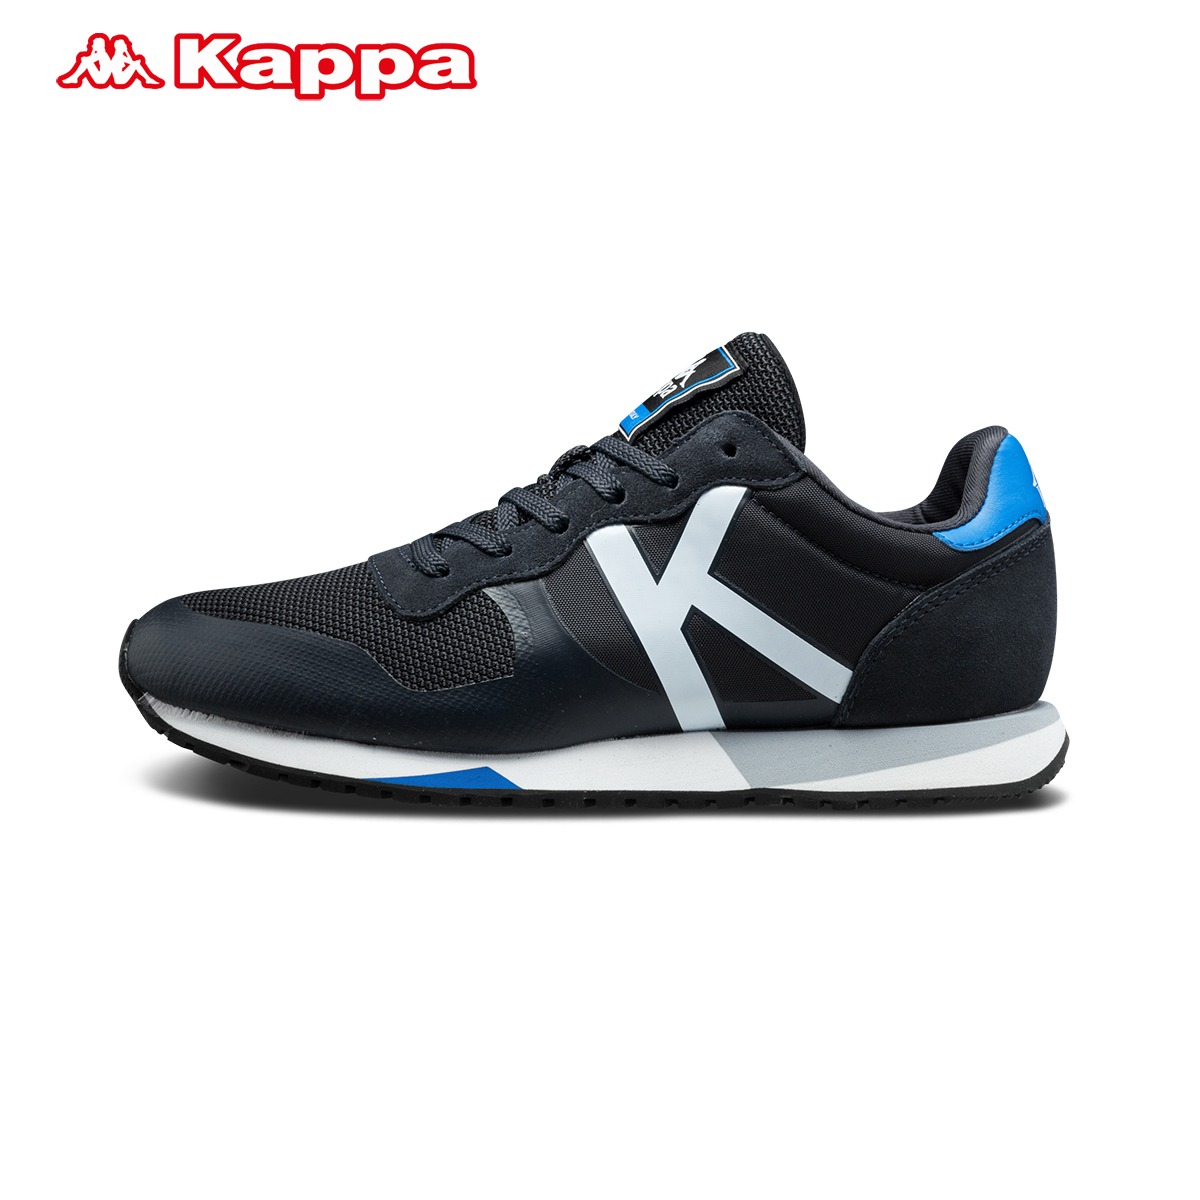 Kappa卡帕情侶男女運動跑步鞋 運動鞋休閑 |K0755MM31